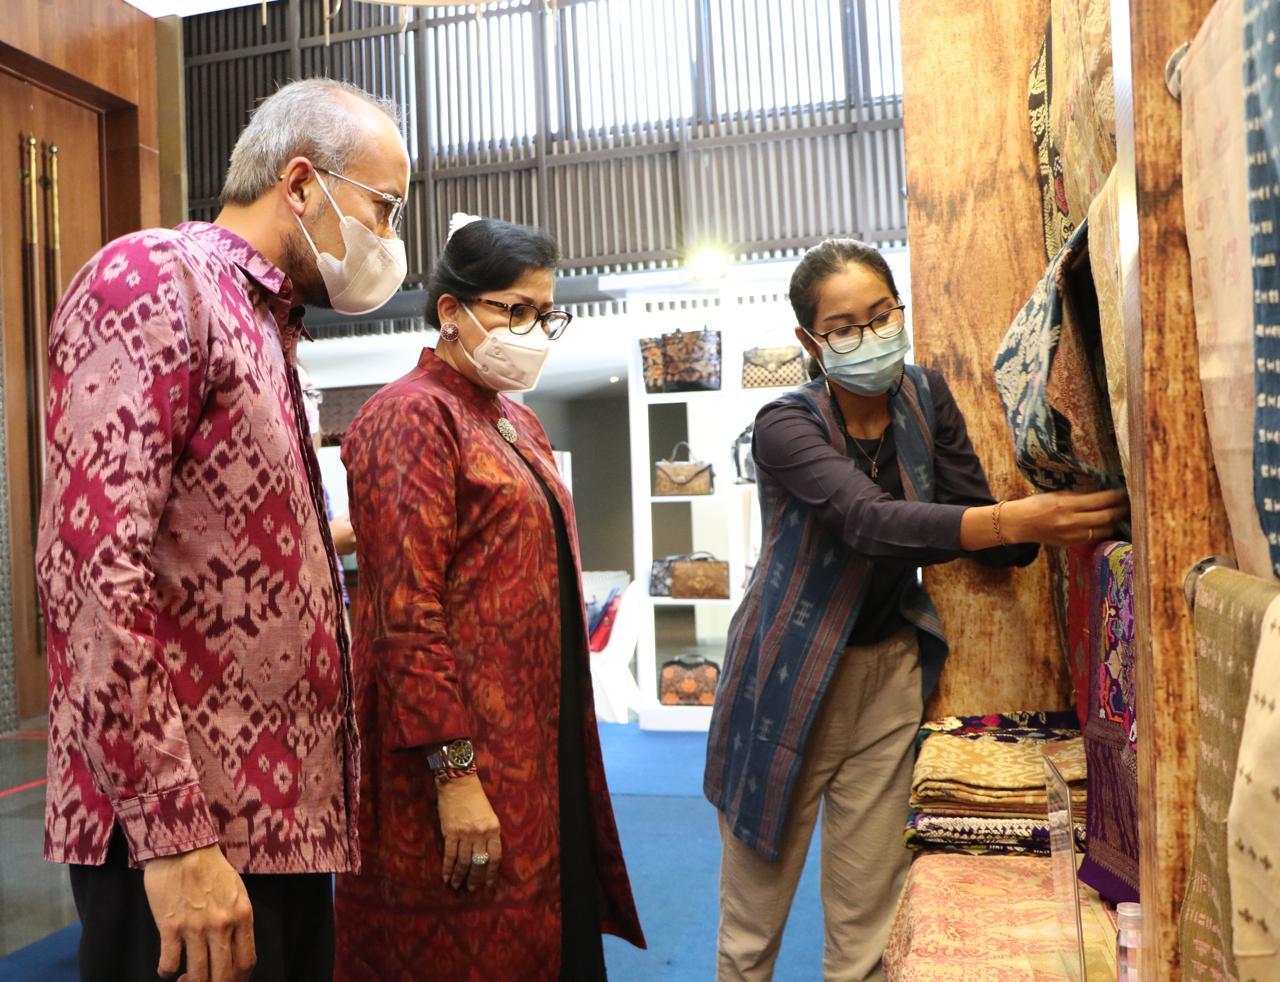 Ketua Dekranasda bali, Ny Putri Suastini Koster saat meninjau pameran